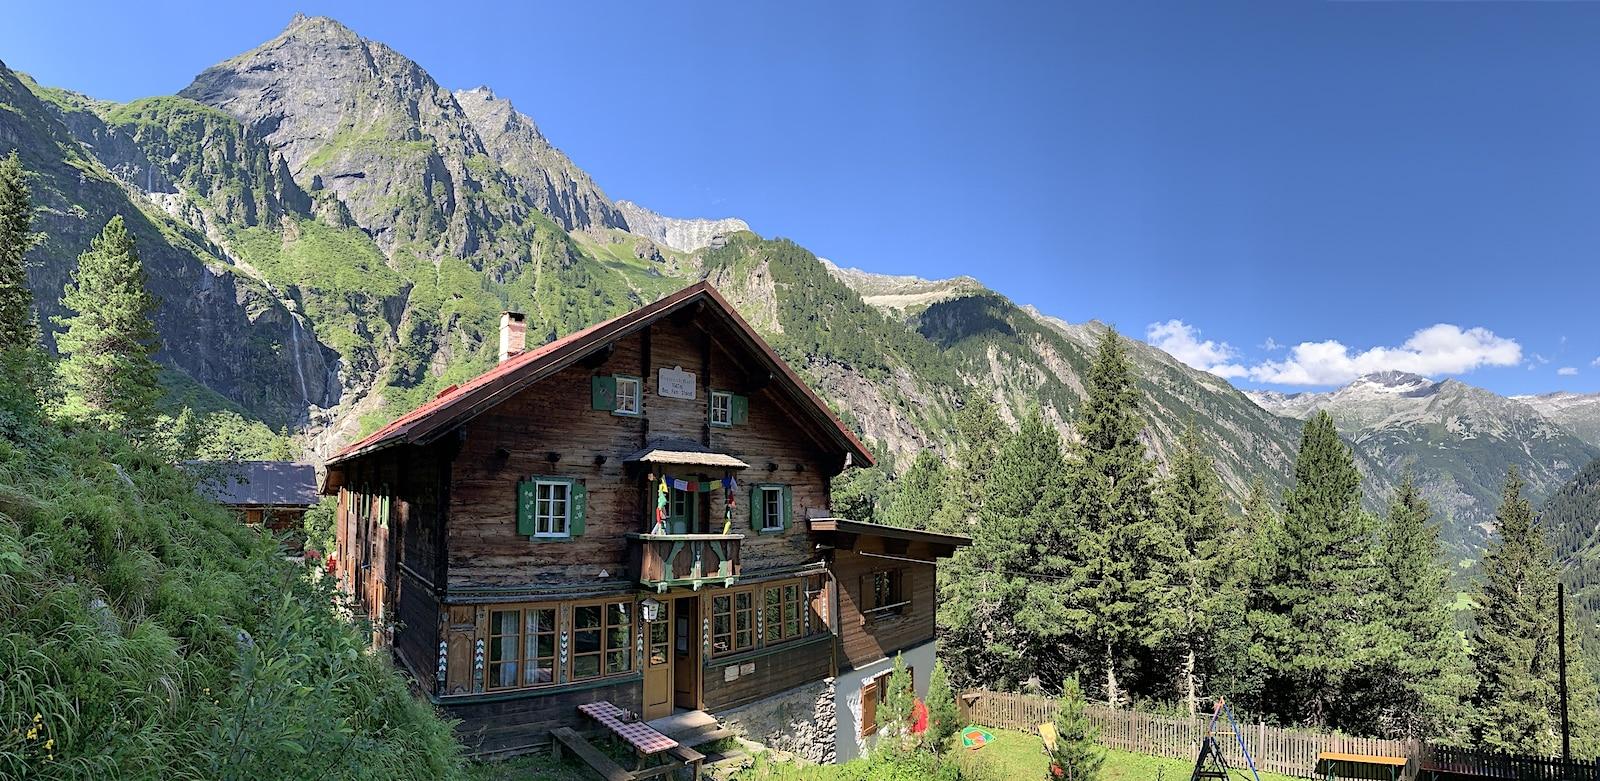 Grawandhütte Zillertal Panorama